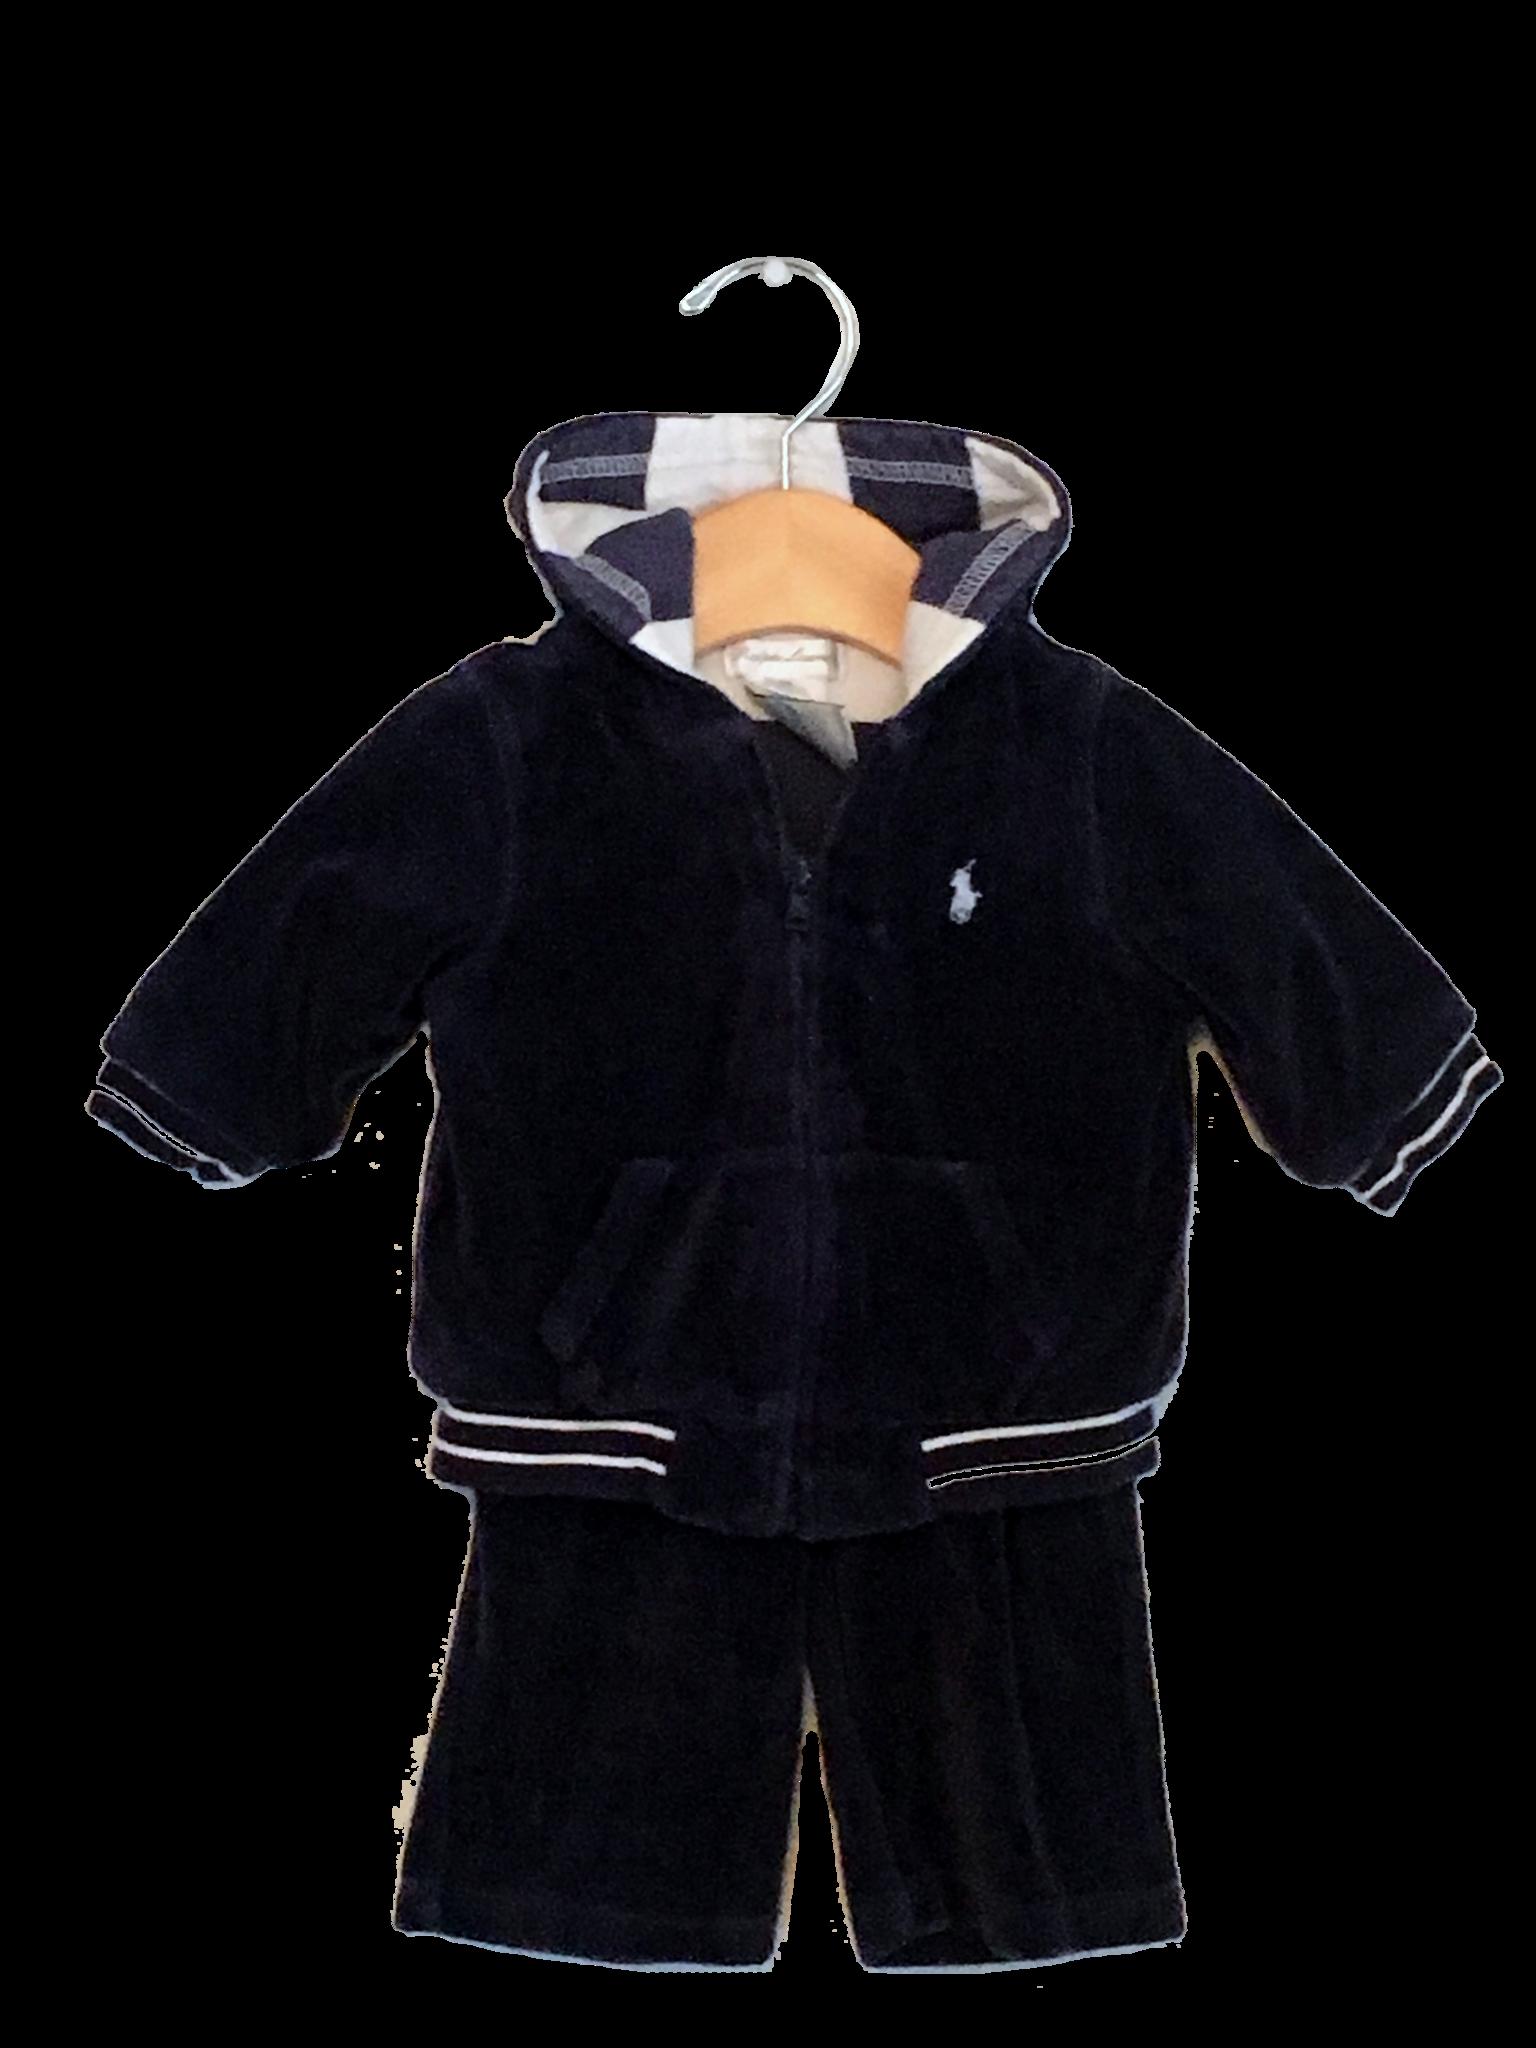 Track Suit By Ralph Lauren Size 6 Months Ralph Lauren